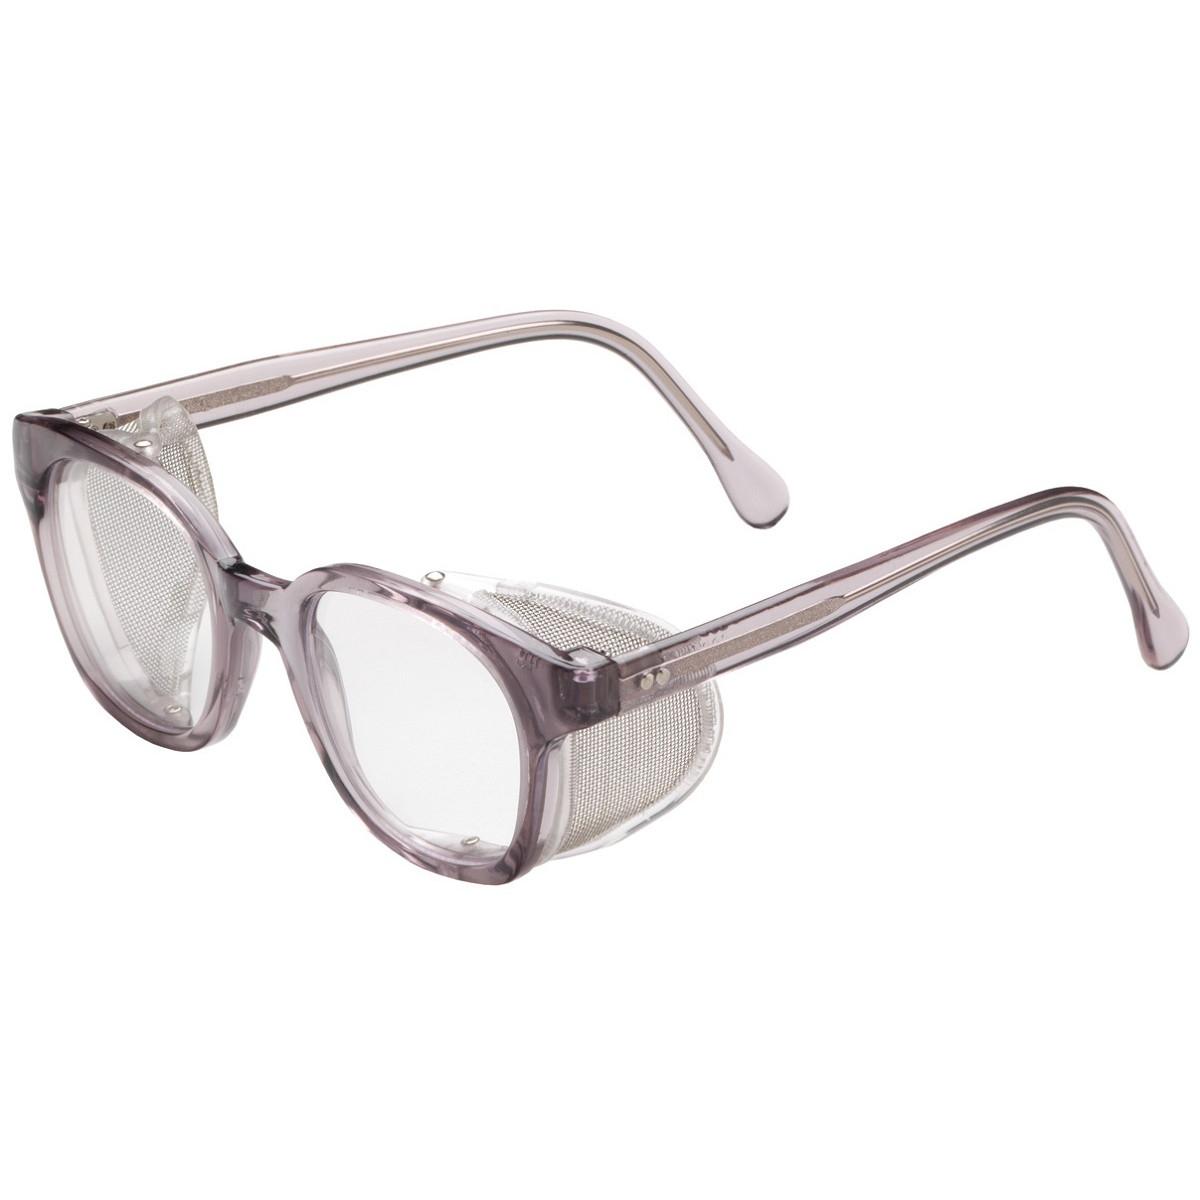 Bouton 5900 traditional safety glasses smoke frame for Anti bouton maison